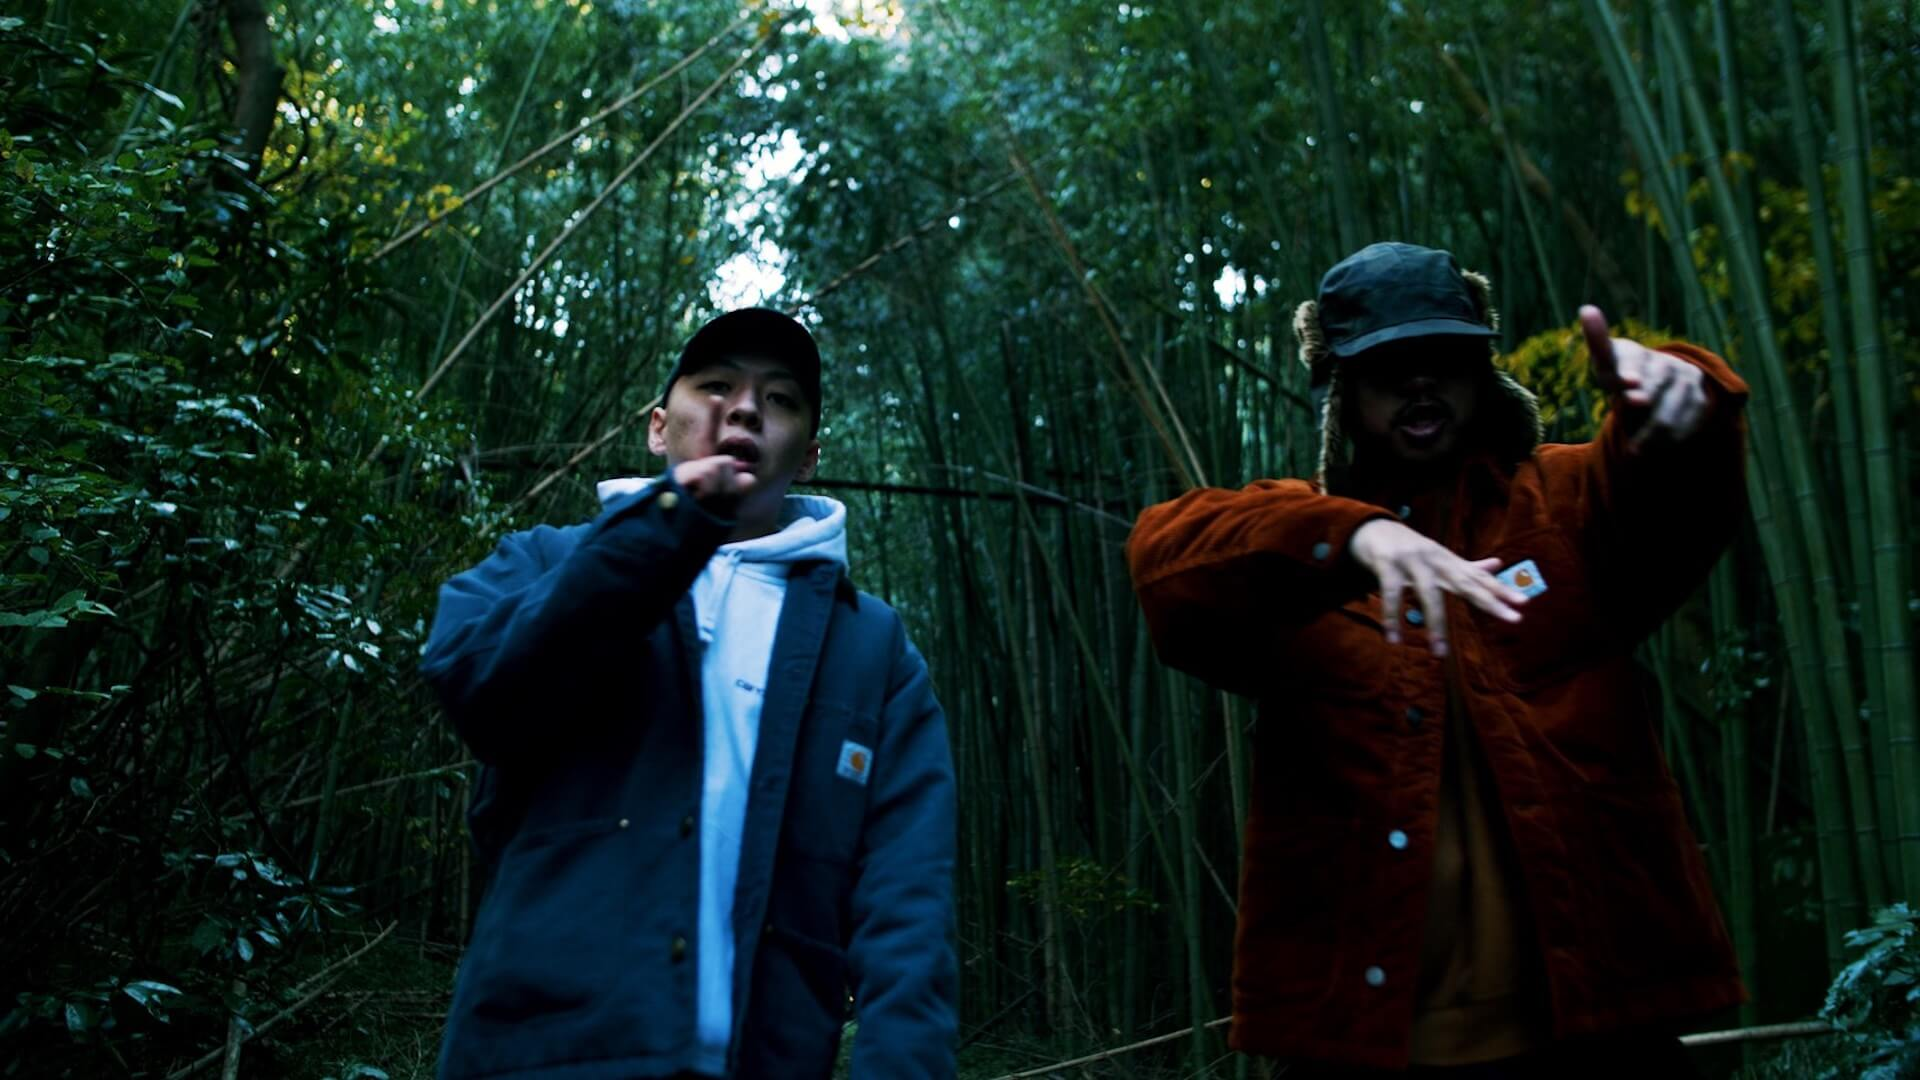 BAKU率いる〈KAIKOO〉より、MATSUIGODZILLAのデビューシングル「GODDAMN」がリリース|rkemishi、MILES WORDが客演 ジャケにはKILLER-BONG参加 music210120-matsuigodzilla-2